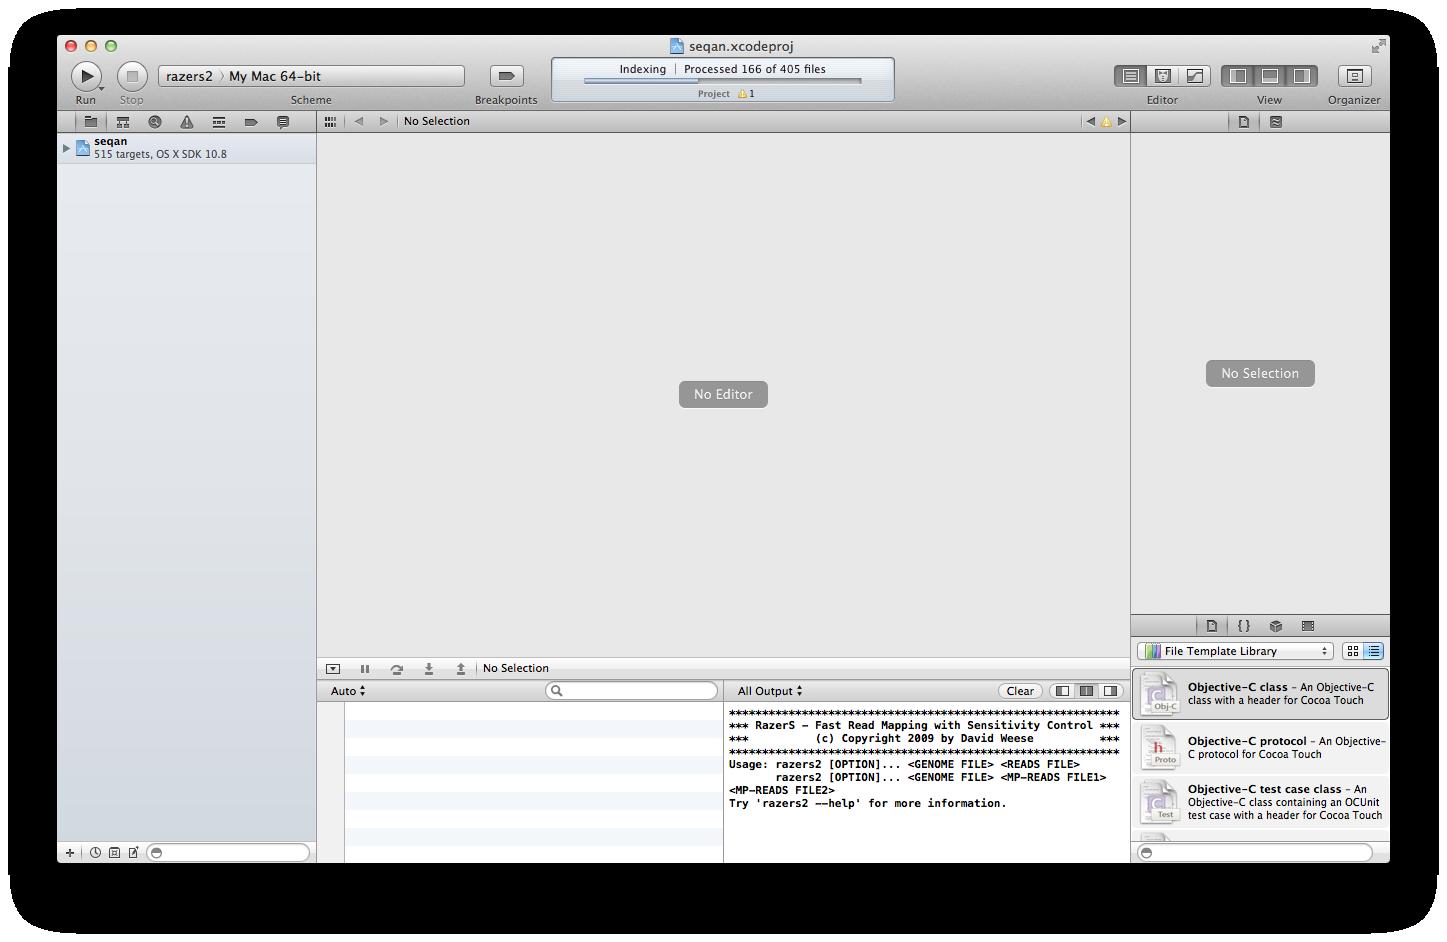 Getting Started With SeqAn On Mac OS X Using Xcode — SeqAn 1 4 2